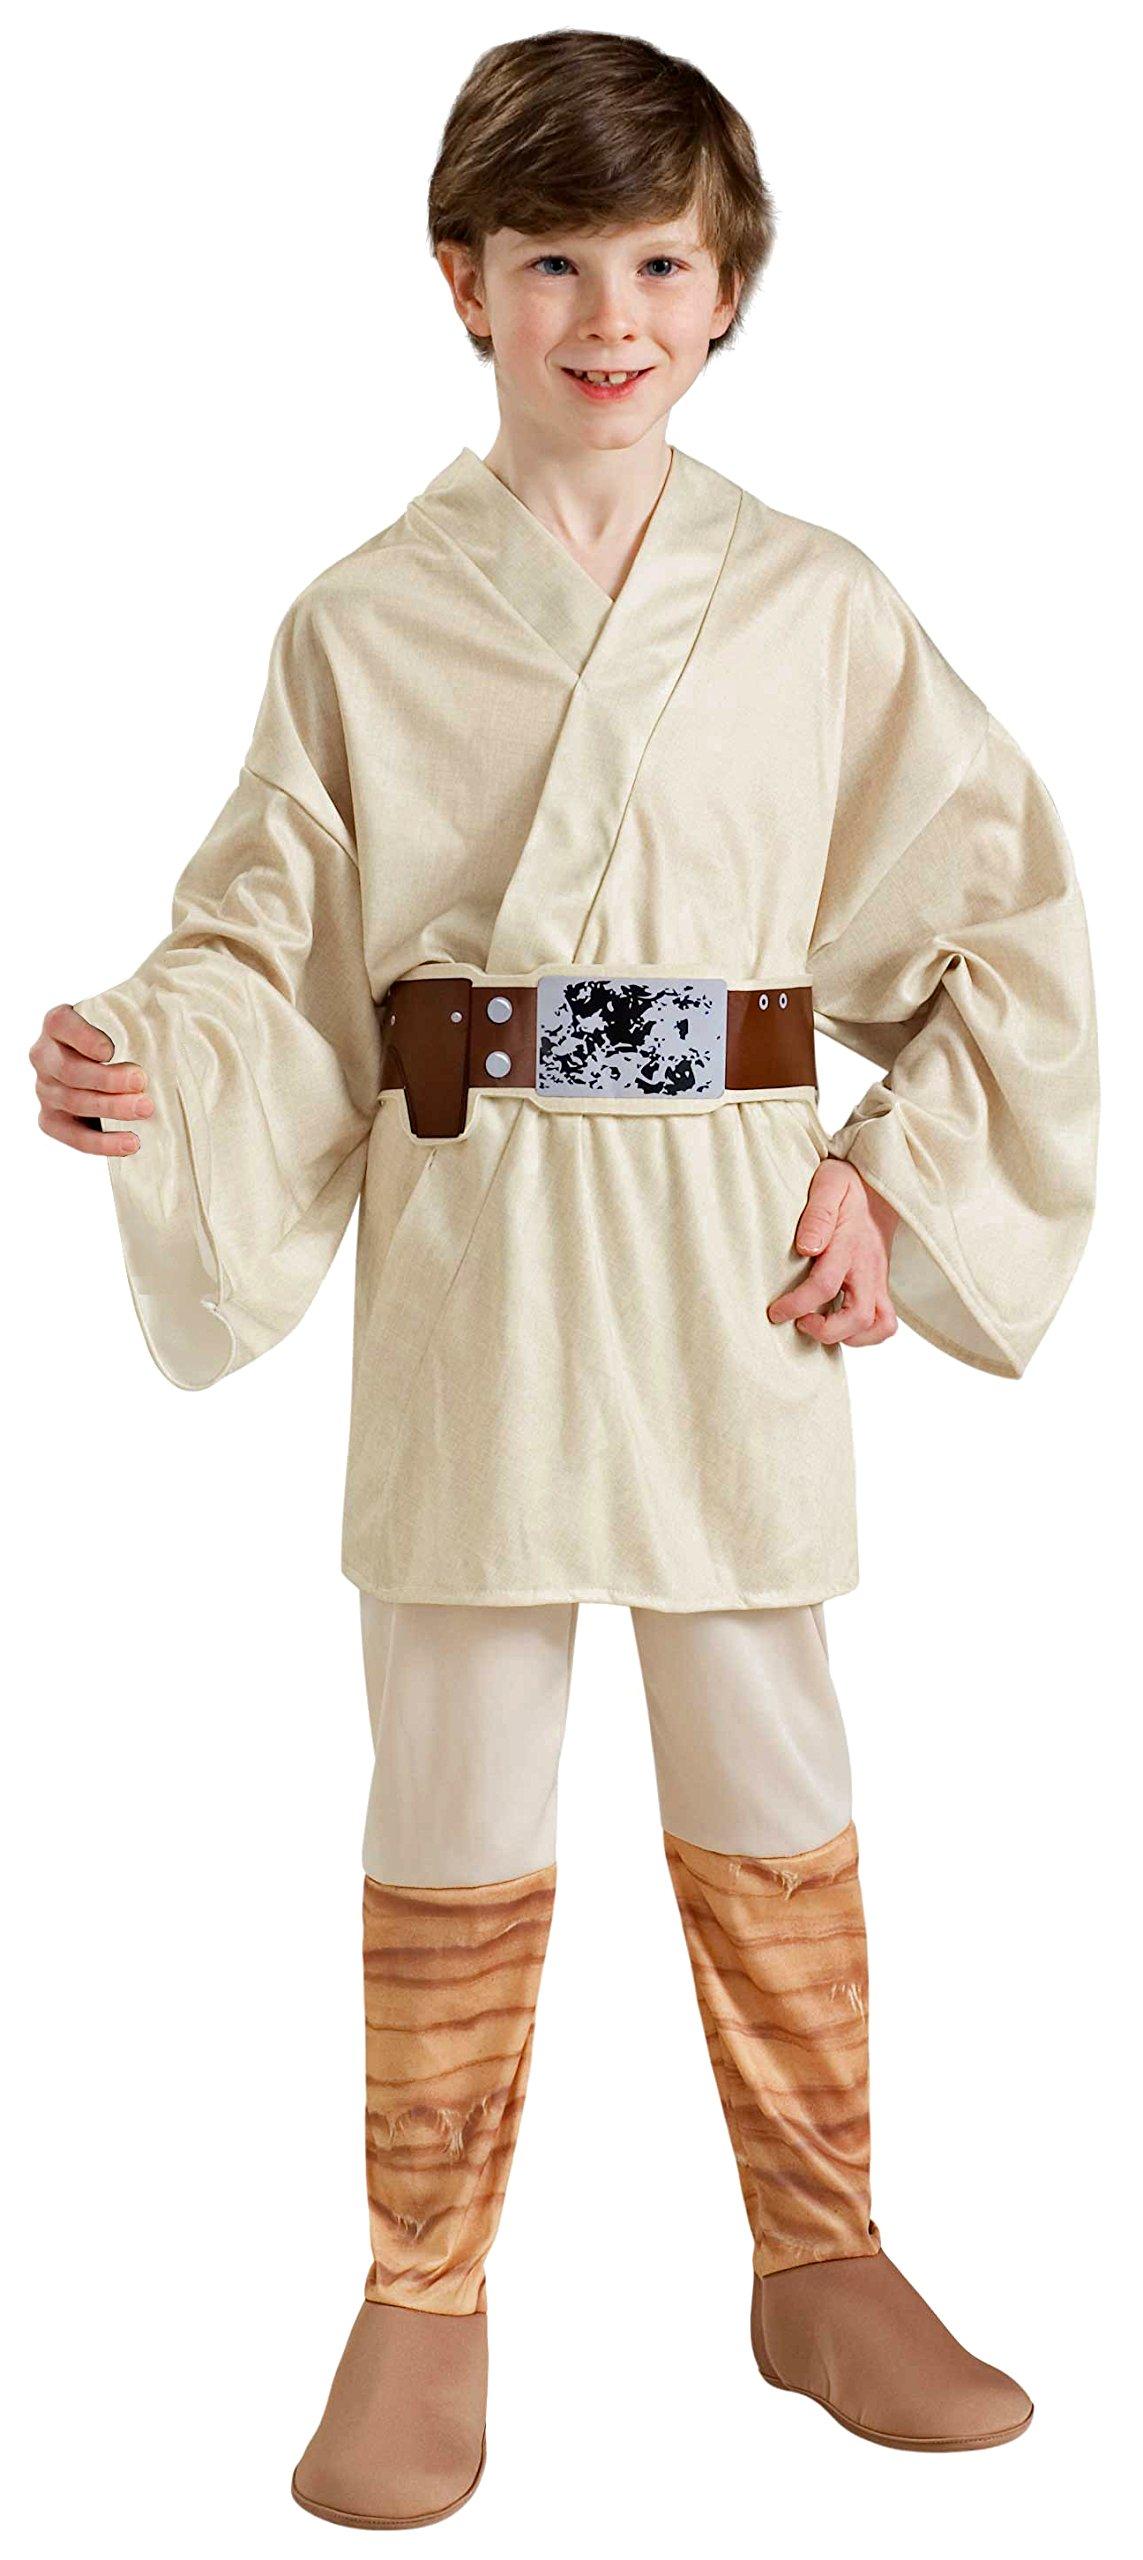 Rubie's Star Wars Classic Child's Luke Skywalker Costume, Small